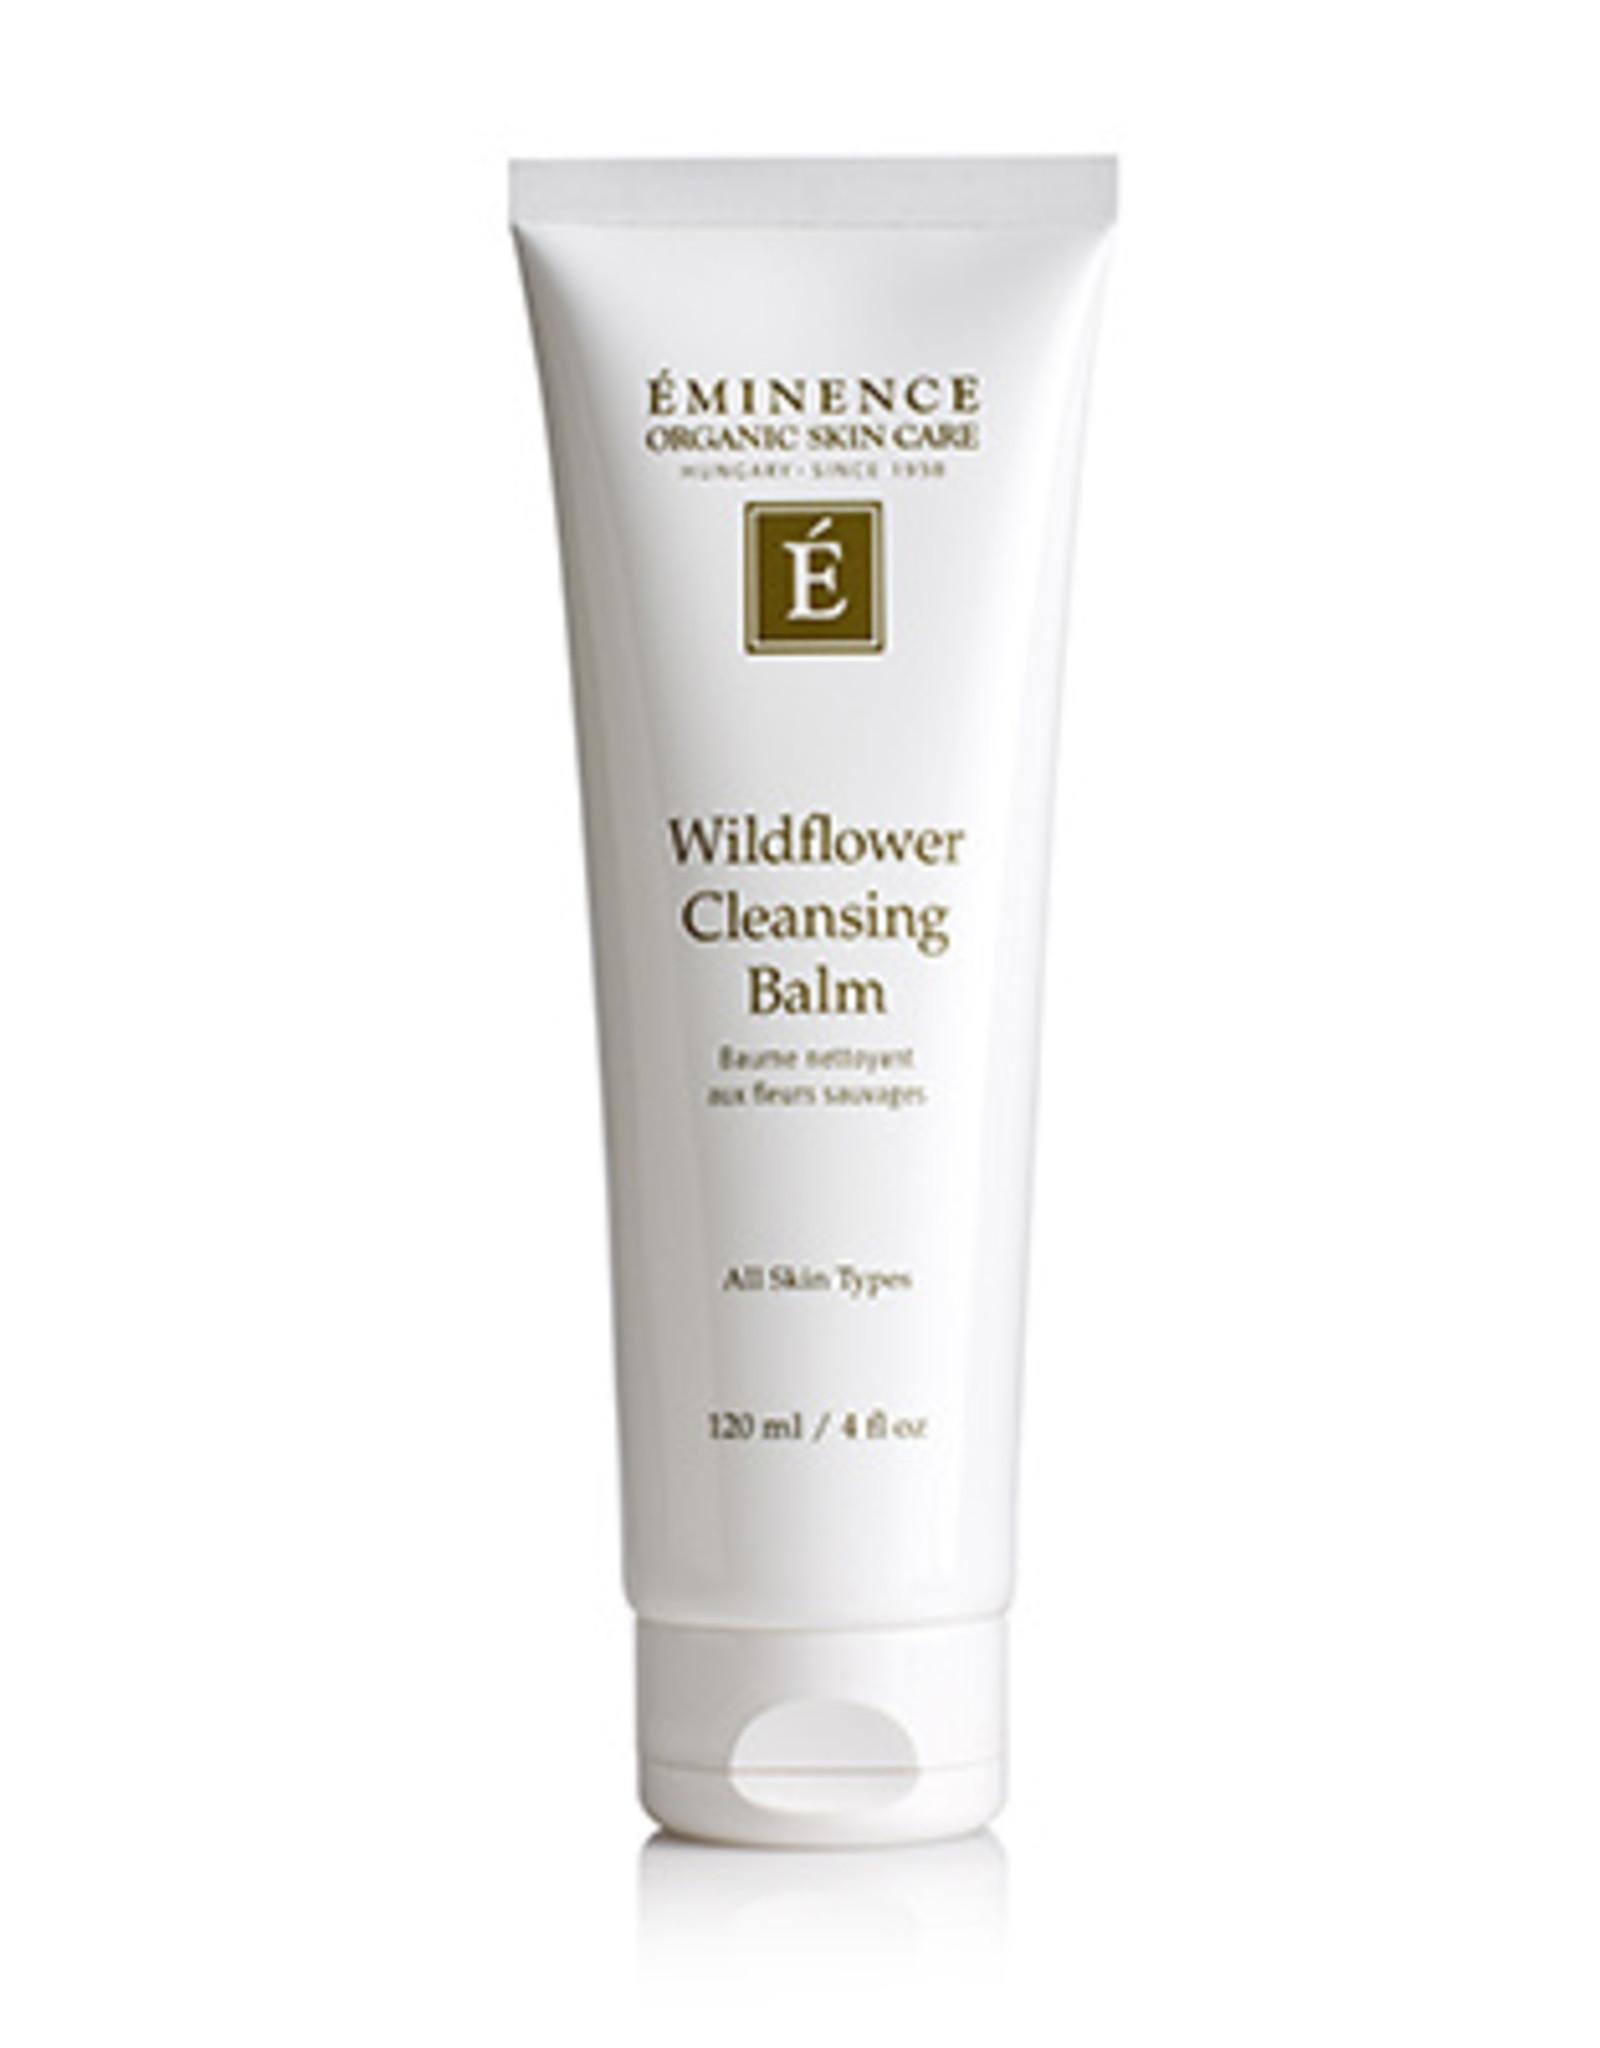 Eminence Organic Skin Care Wildflower Cleansing Balm